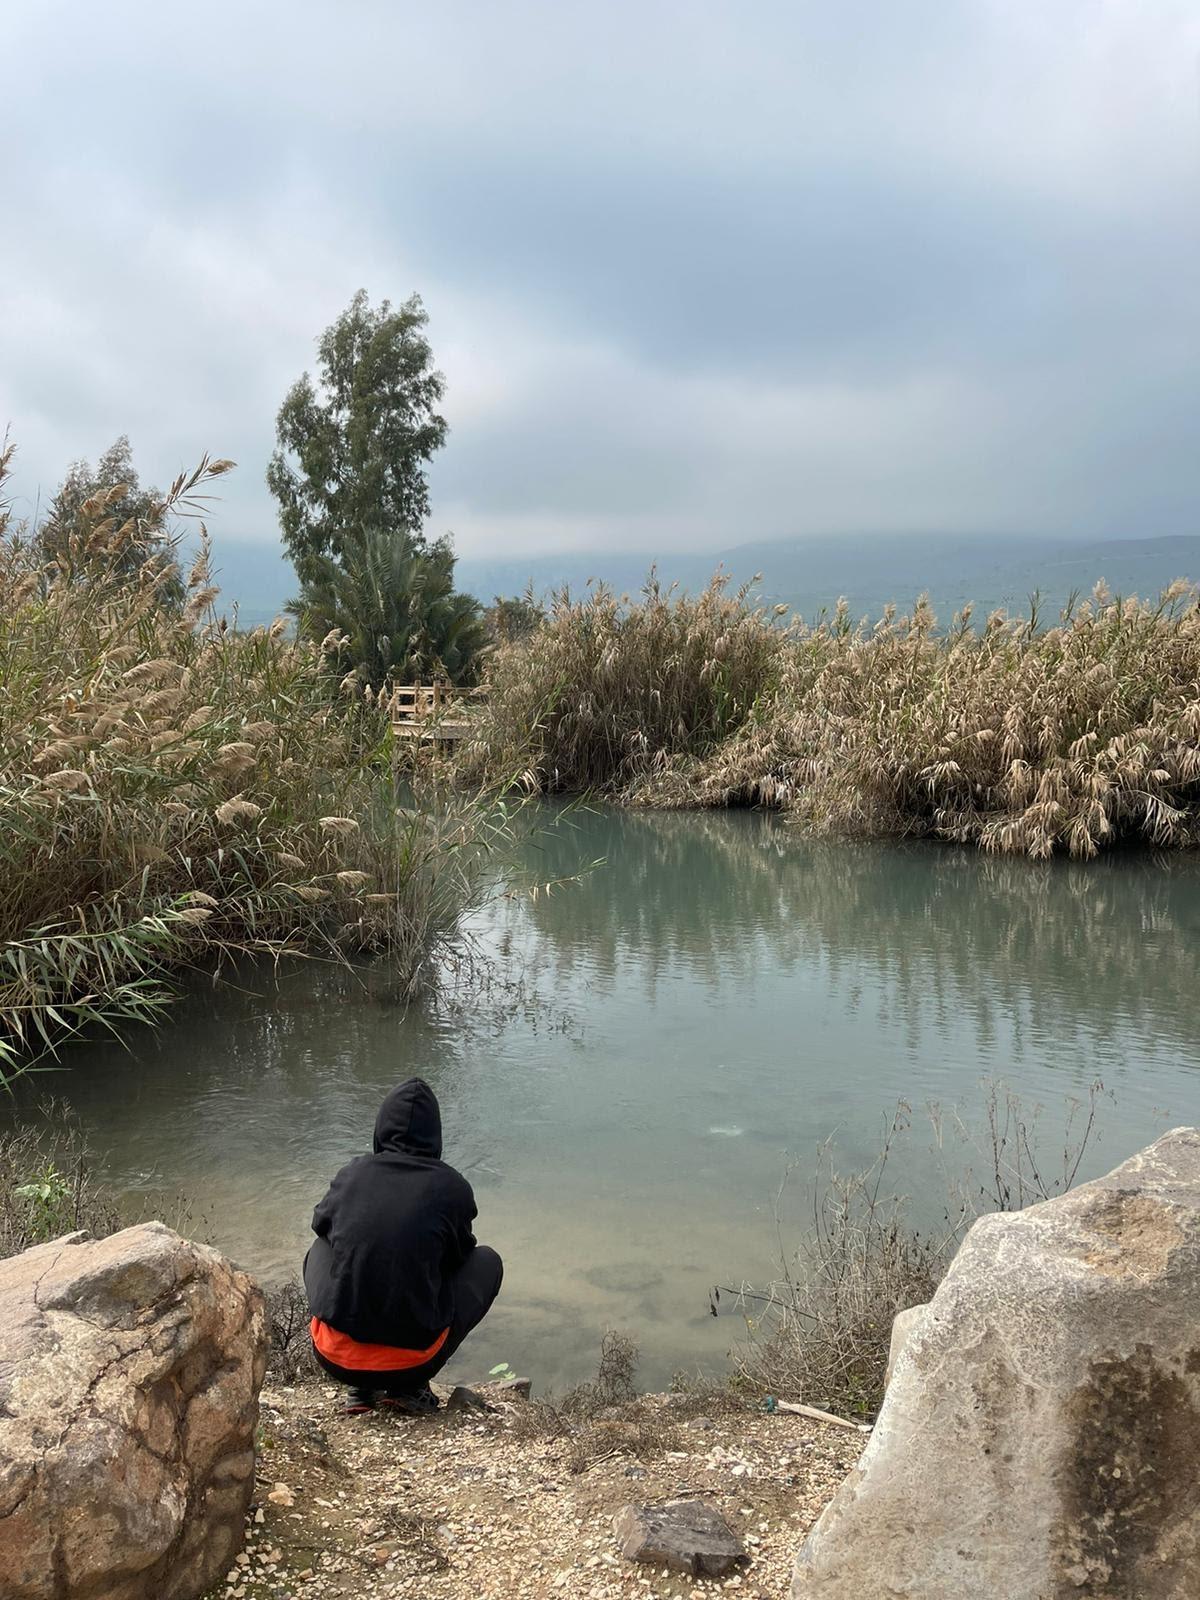 Beit Shean, BINA, home away from home, MITF, Ali Goldberg, teaching English in Israel, river